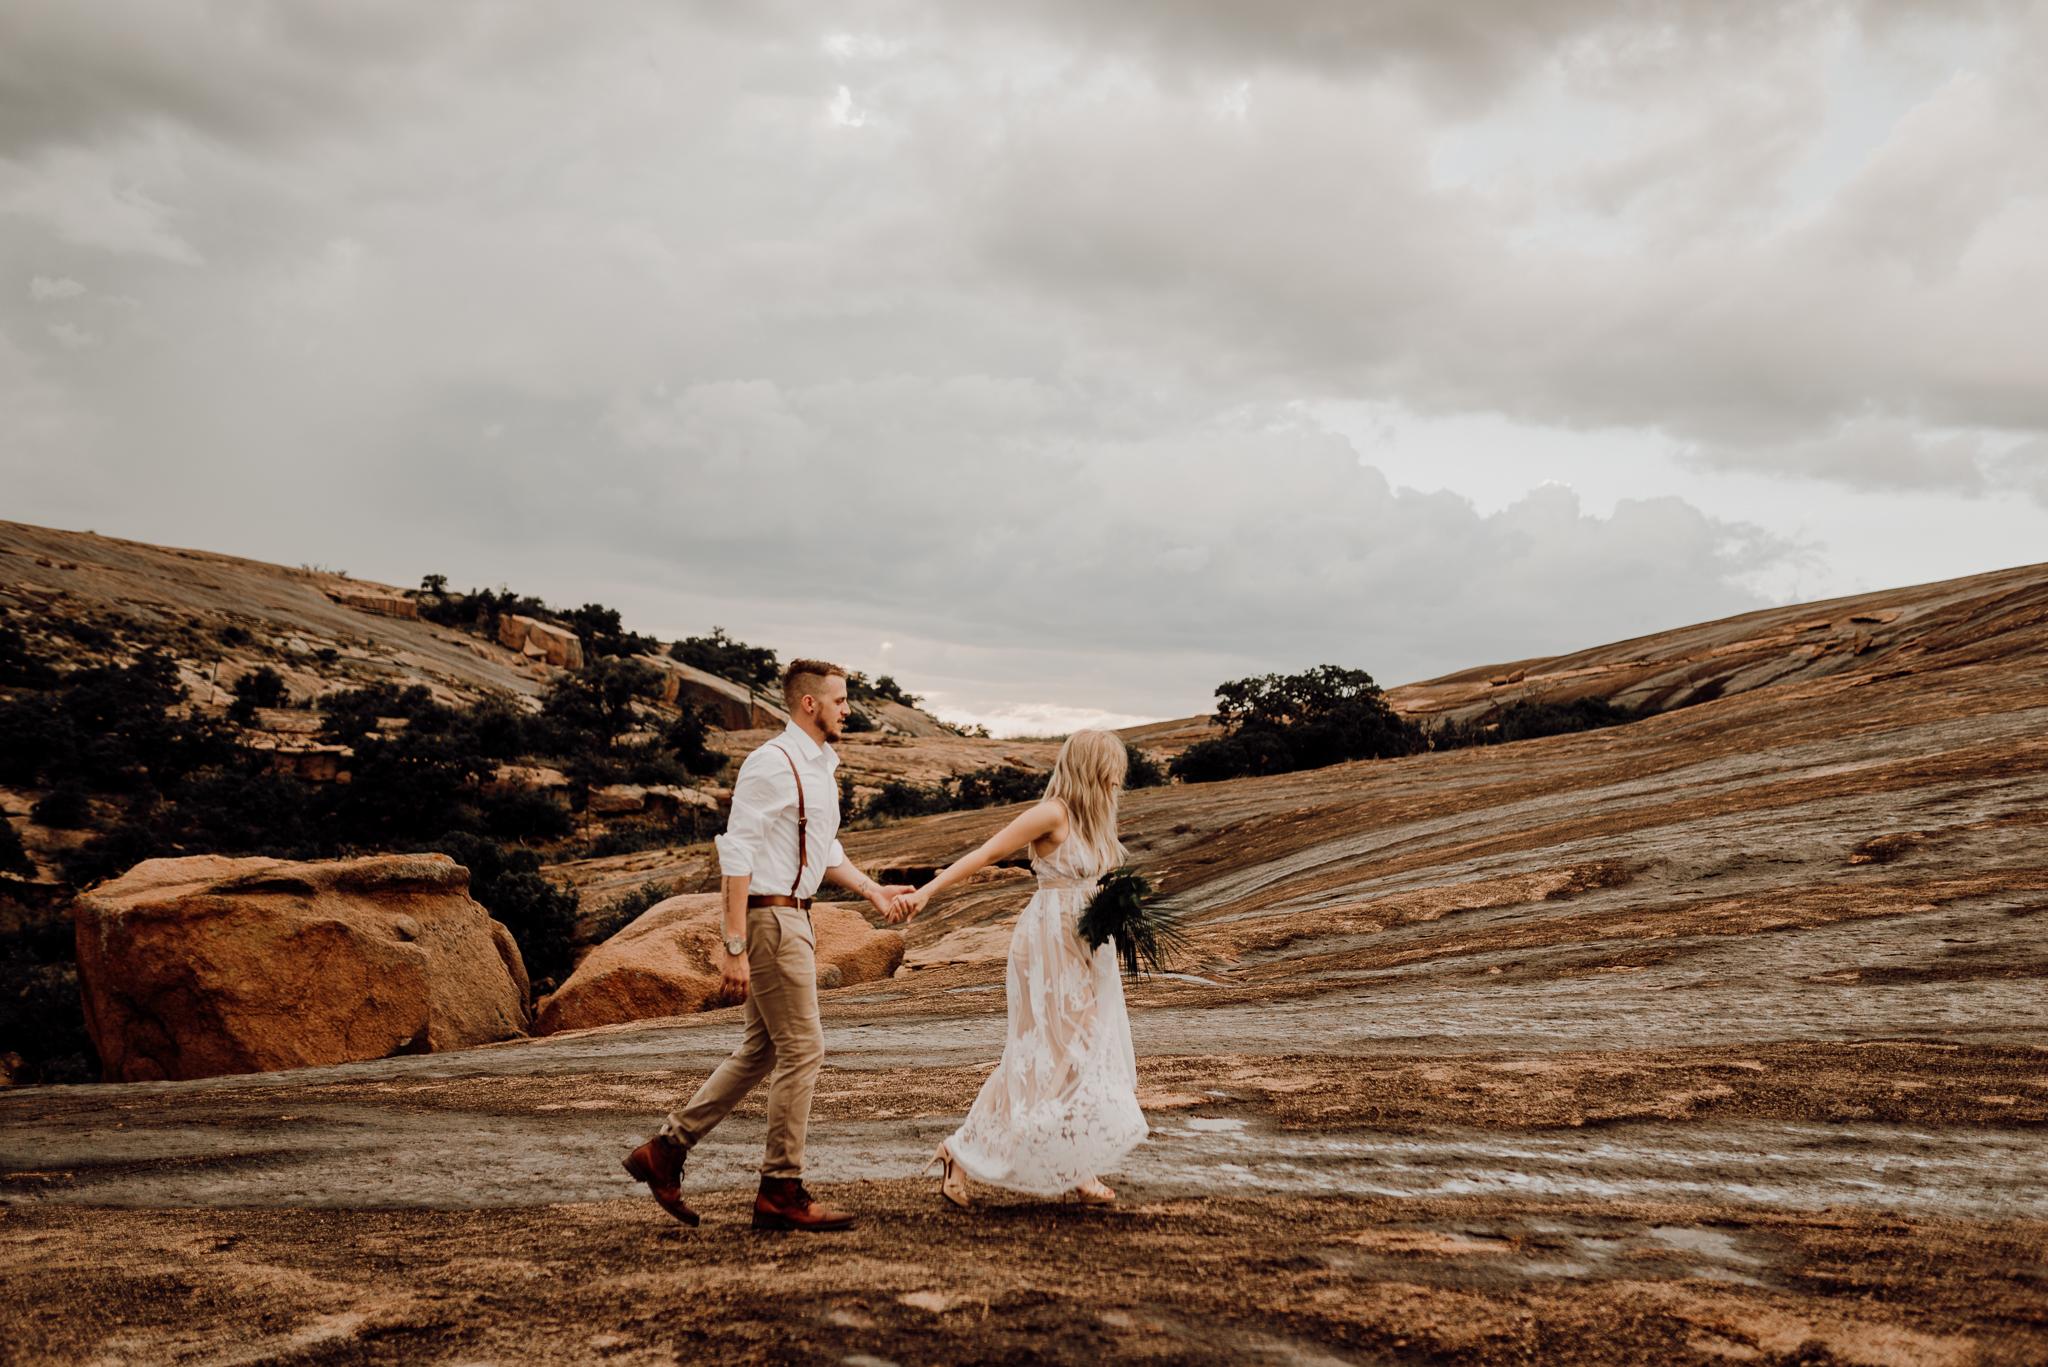 texas-elopement-photographer-enchanted-rock-8-blog.jpg